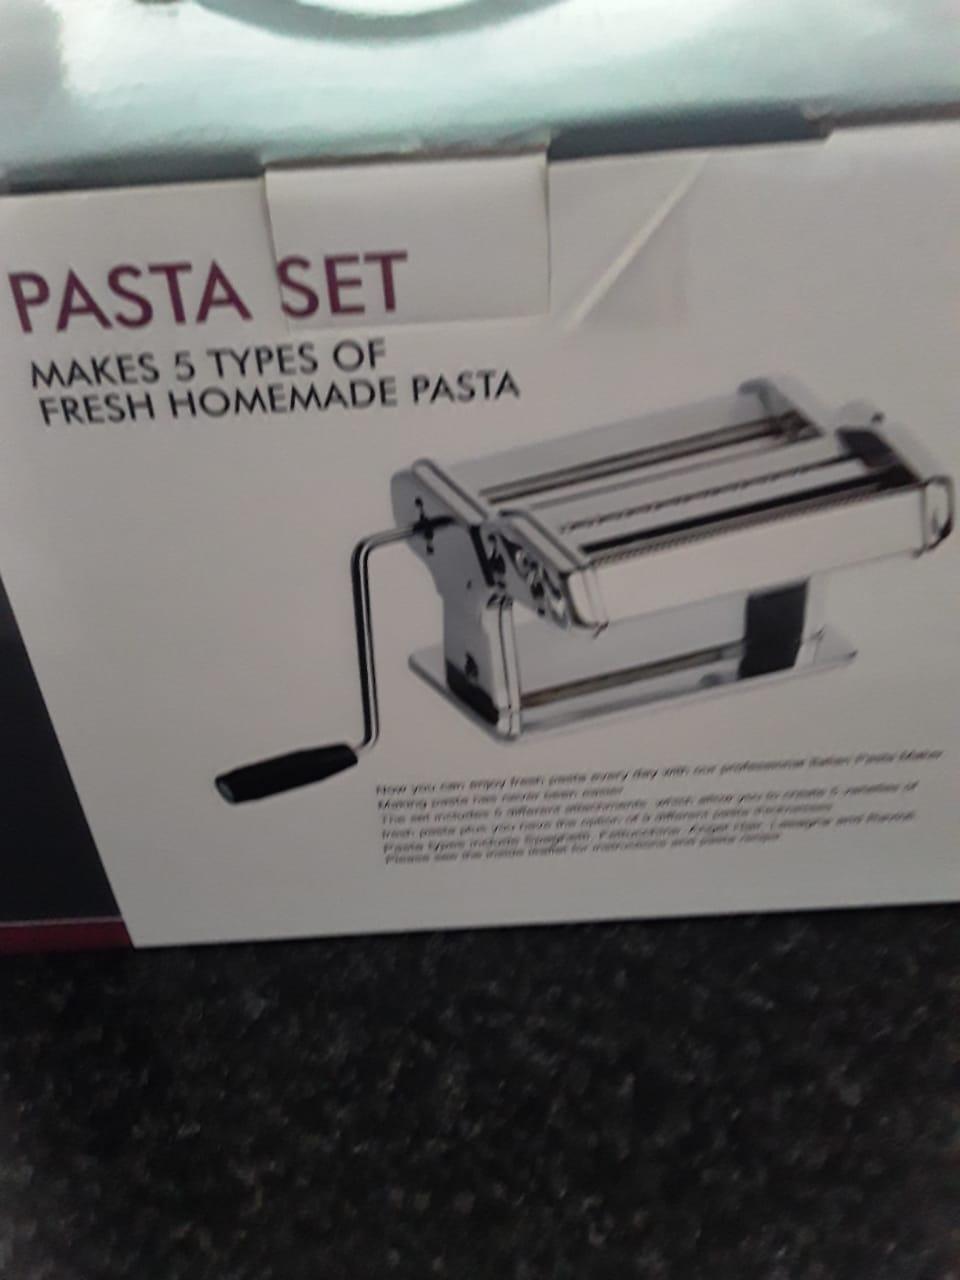 Pasta Maker Set